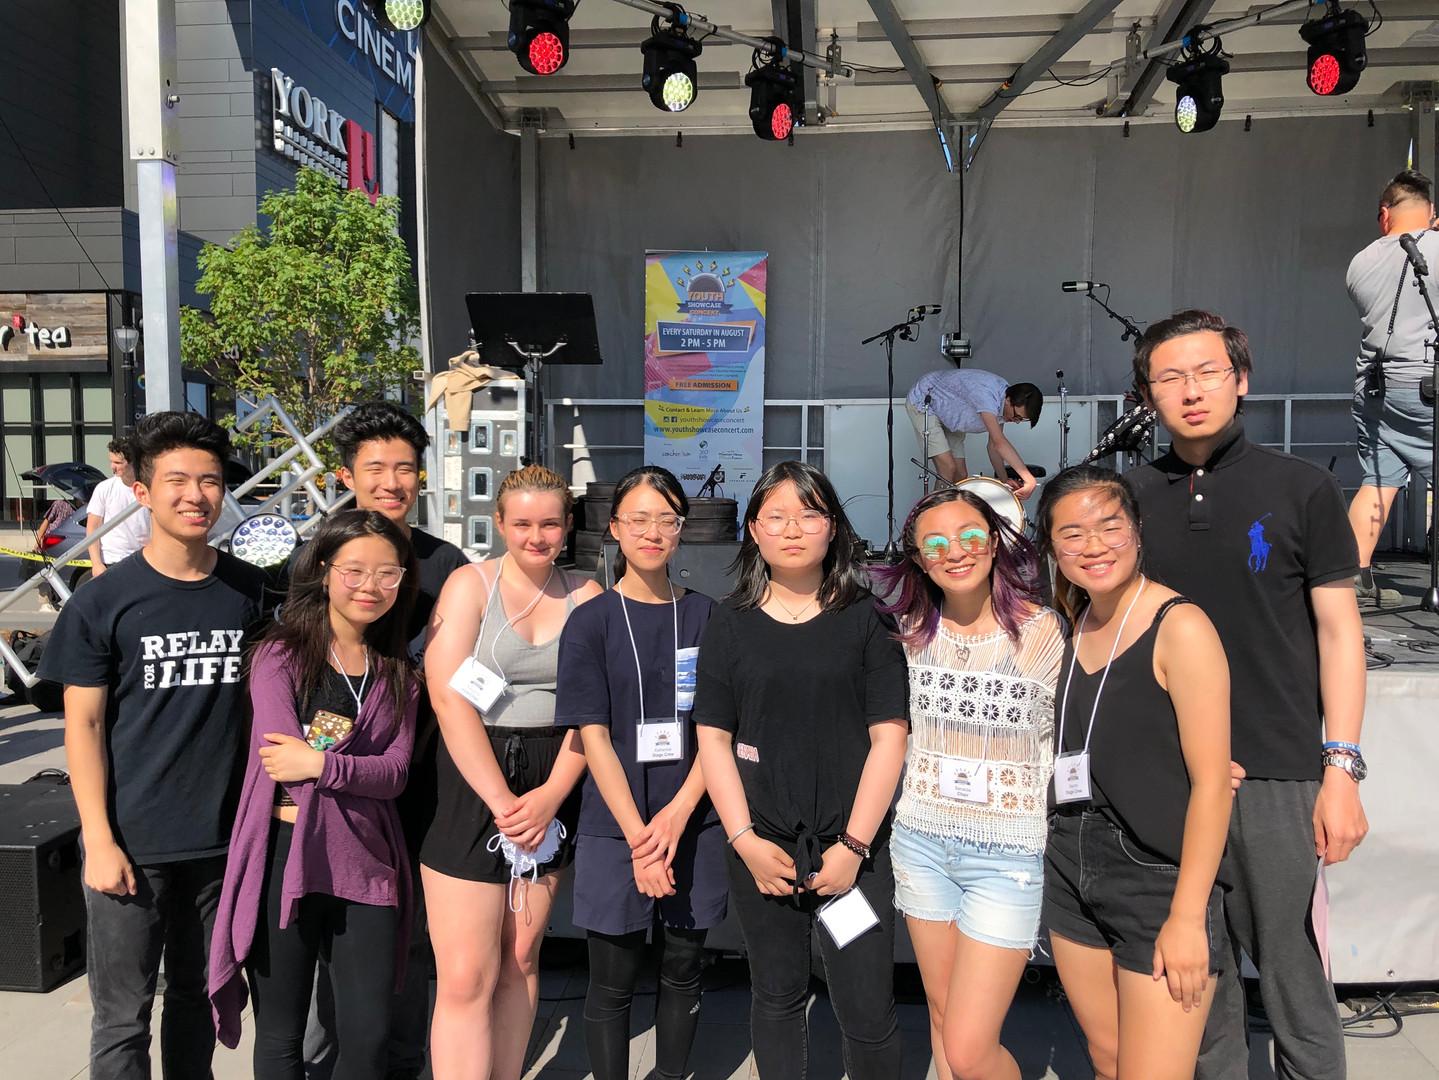 Stage Crew Volunteers at the Kickoff Concert, June 29, 2019